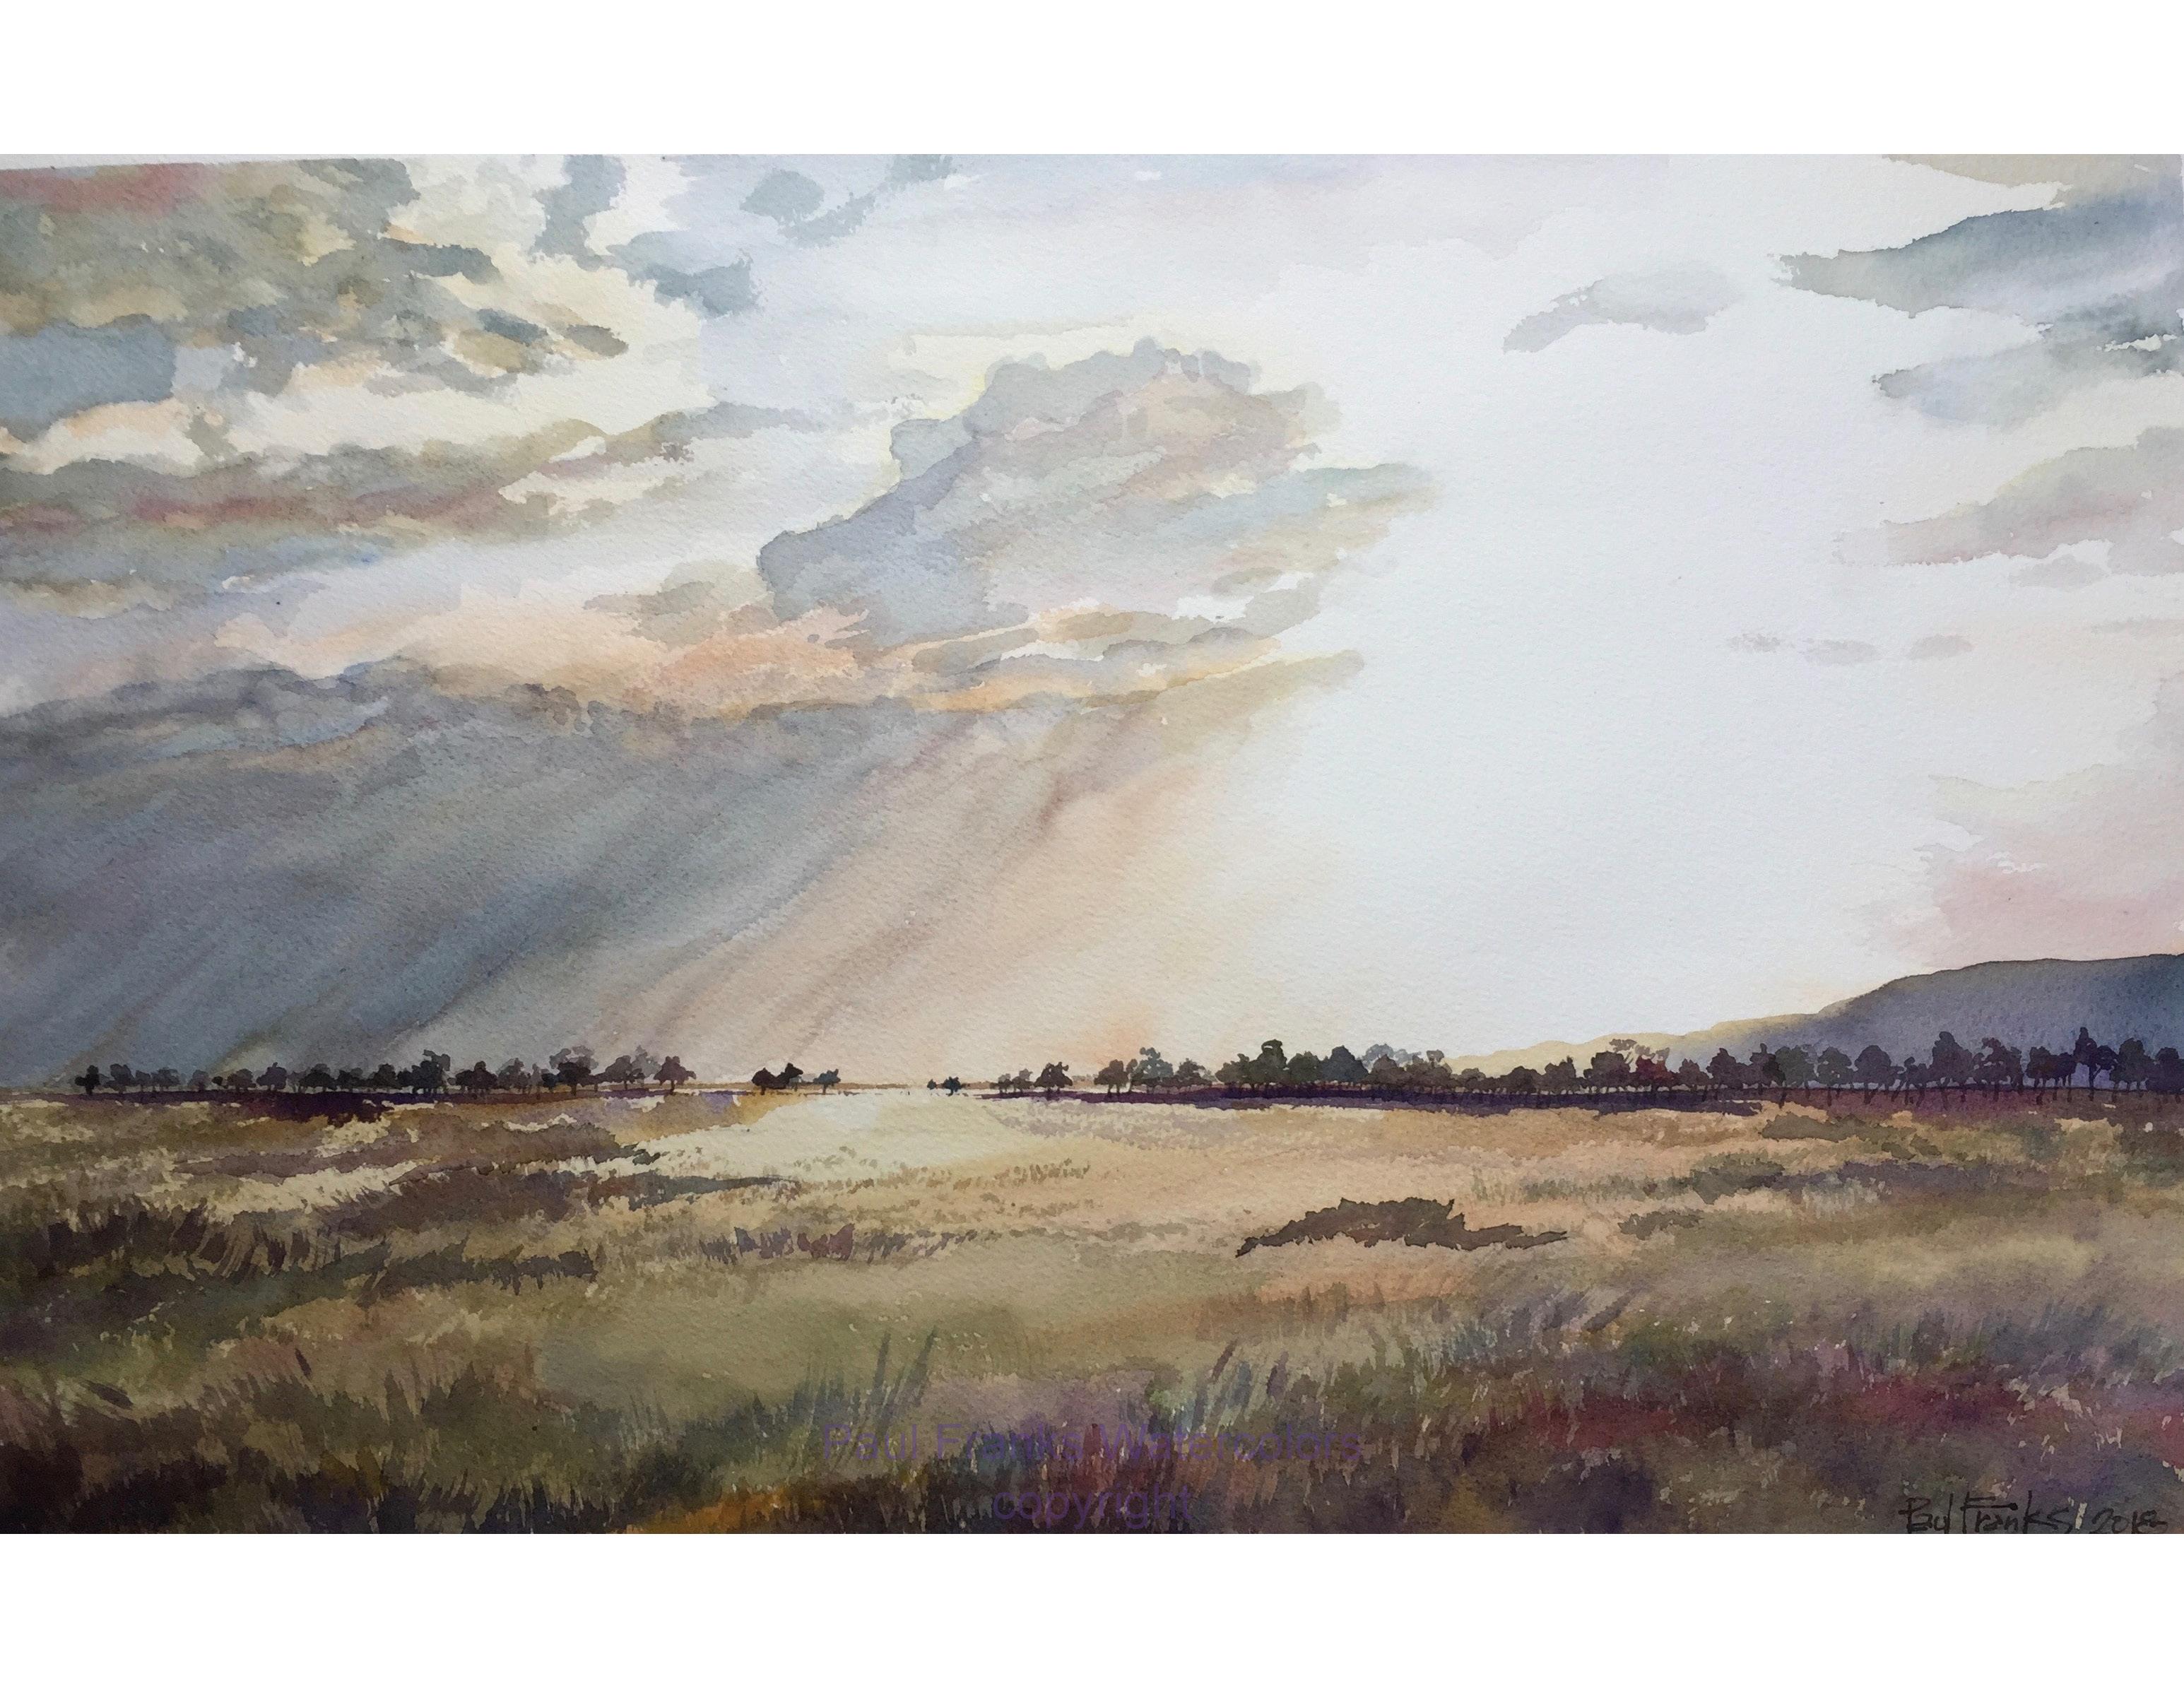 "Silhouettes on the Maasai Mara 14"" x 22"" giclee print $140, framed $320"